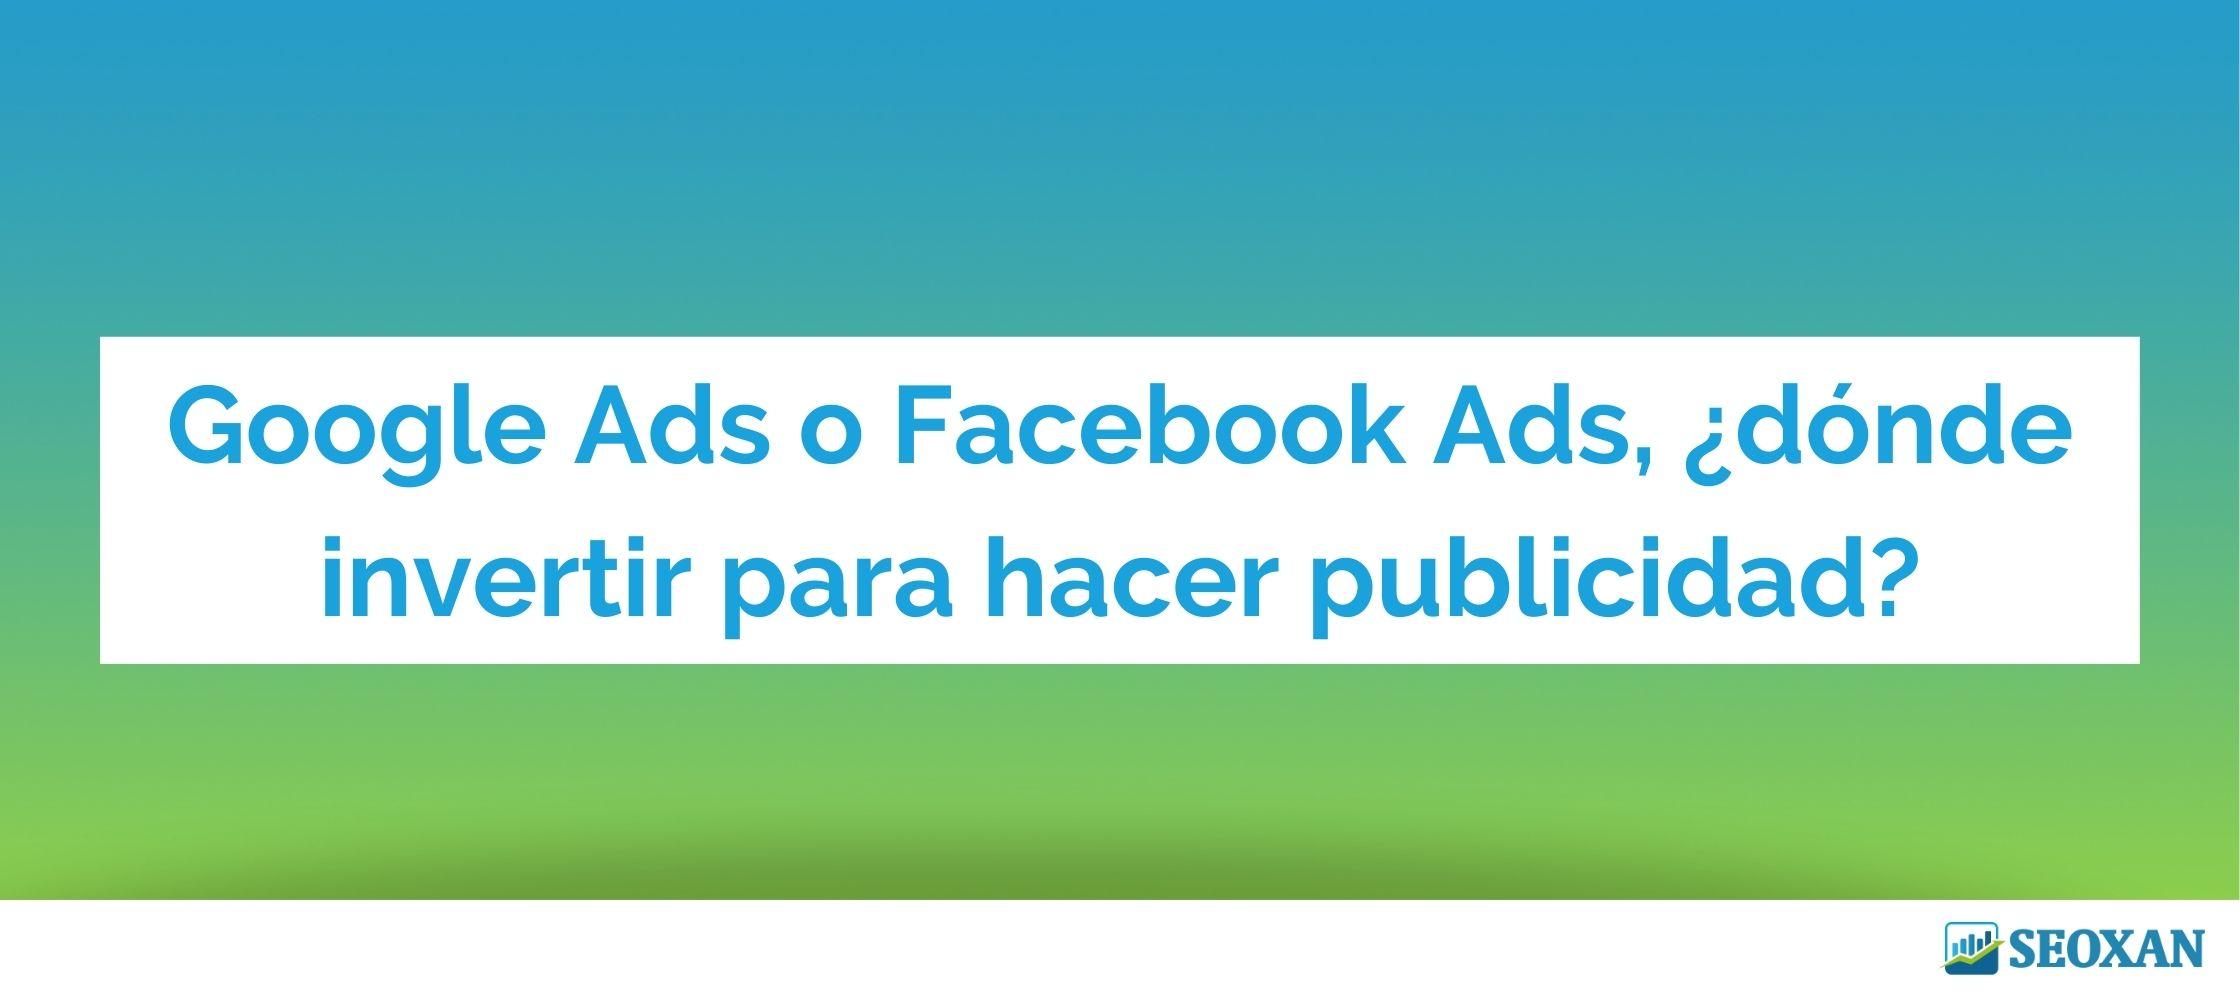 Google Ads o Facebook Ads, ¿dónde invertir para hacer publicidad?